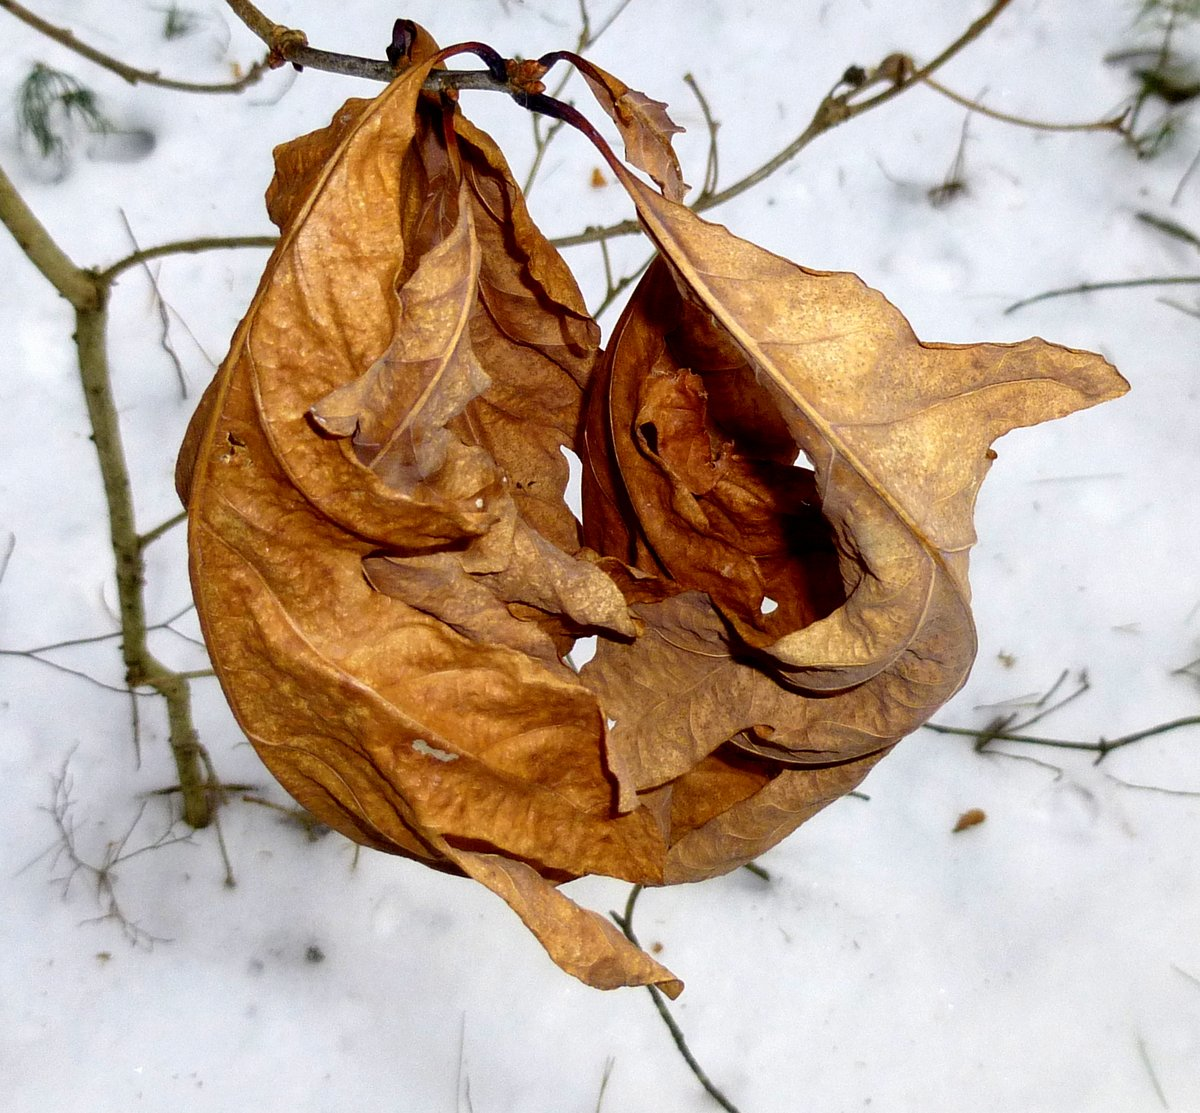 13. Oak Leaves